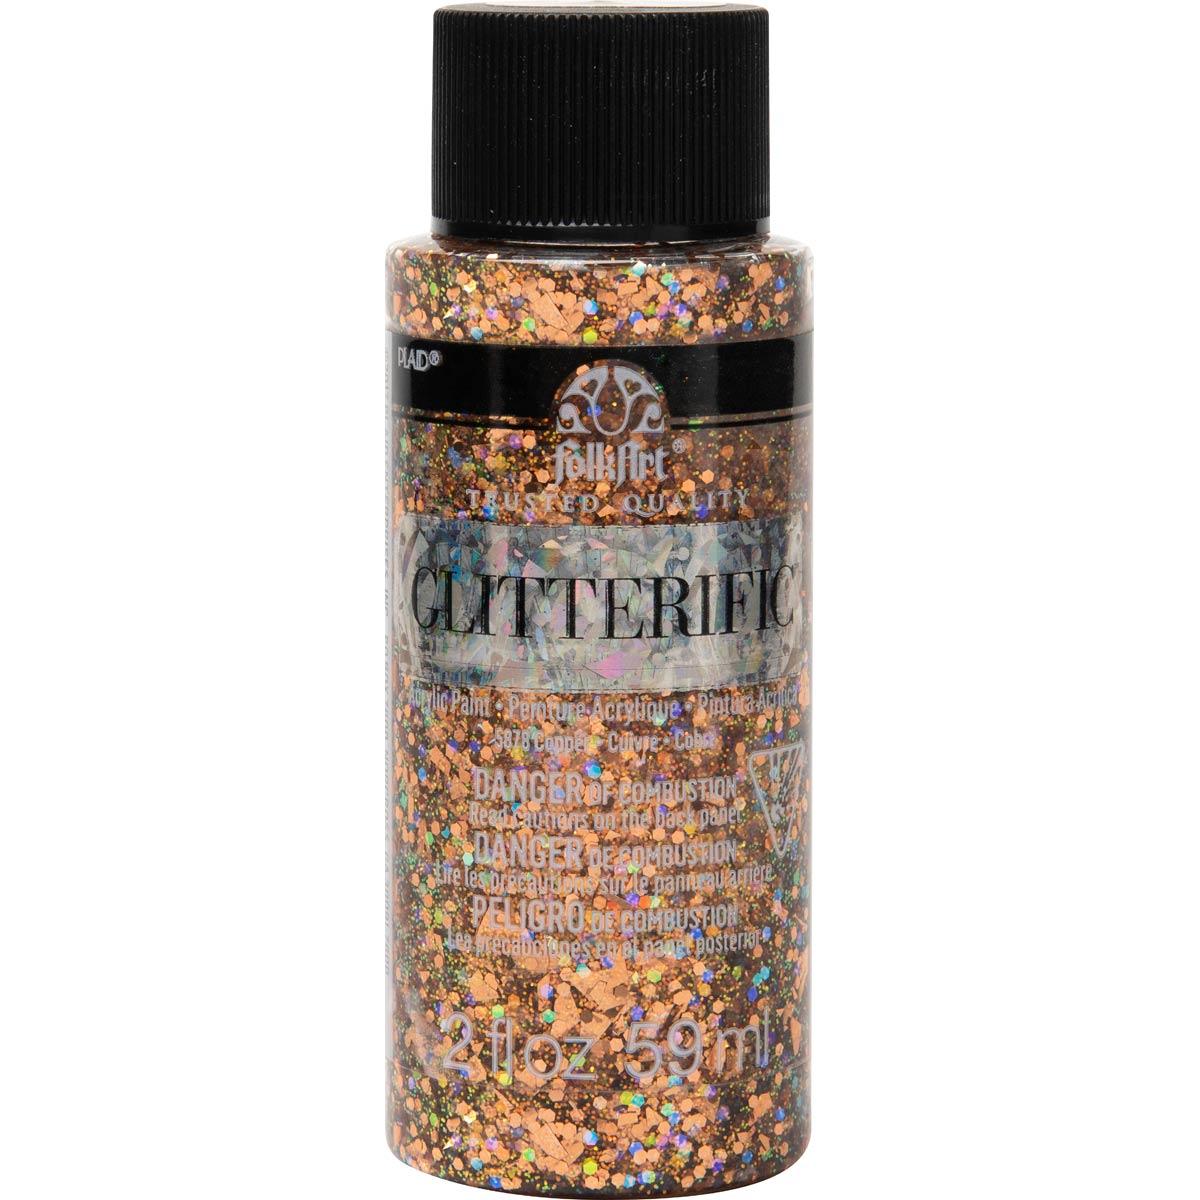 FolkArt ® Glitterific™ Acrylic Paint - Copper, 2 oz.